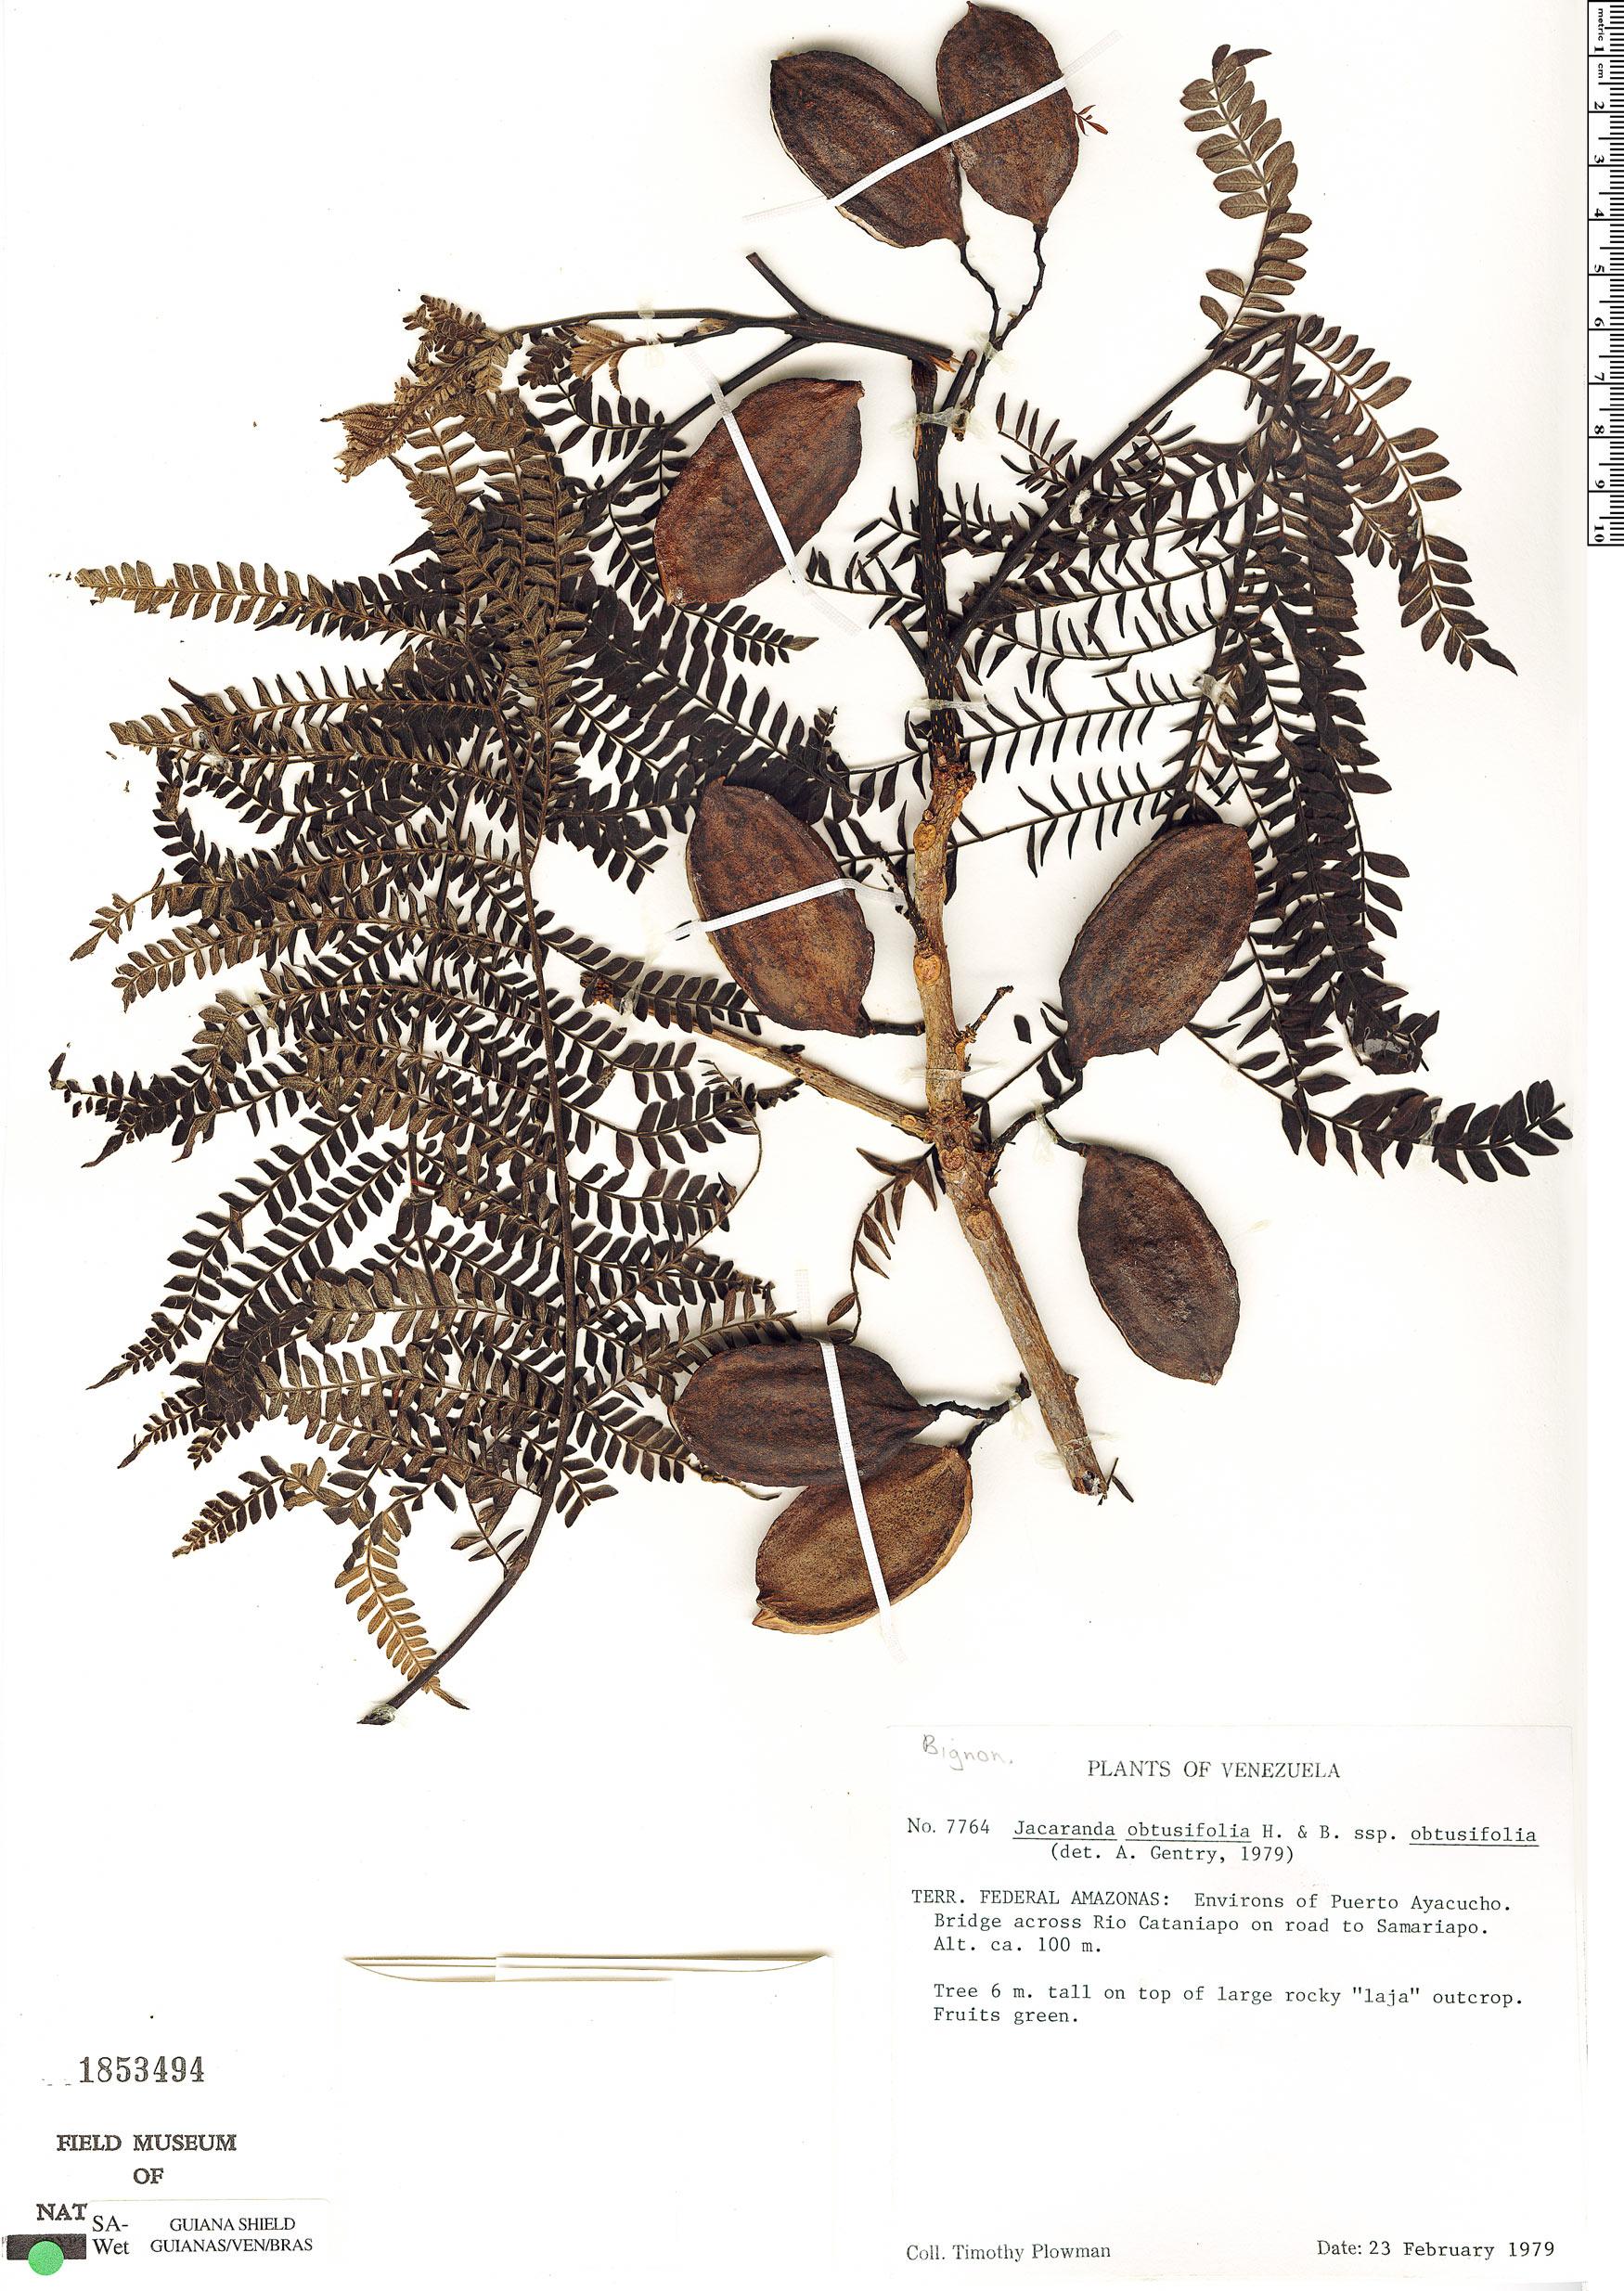 Specimen: Jacaranda obtusifolia